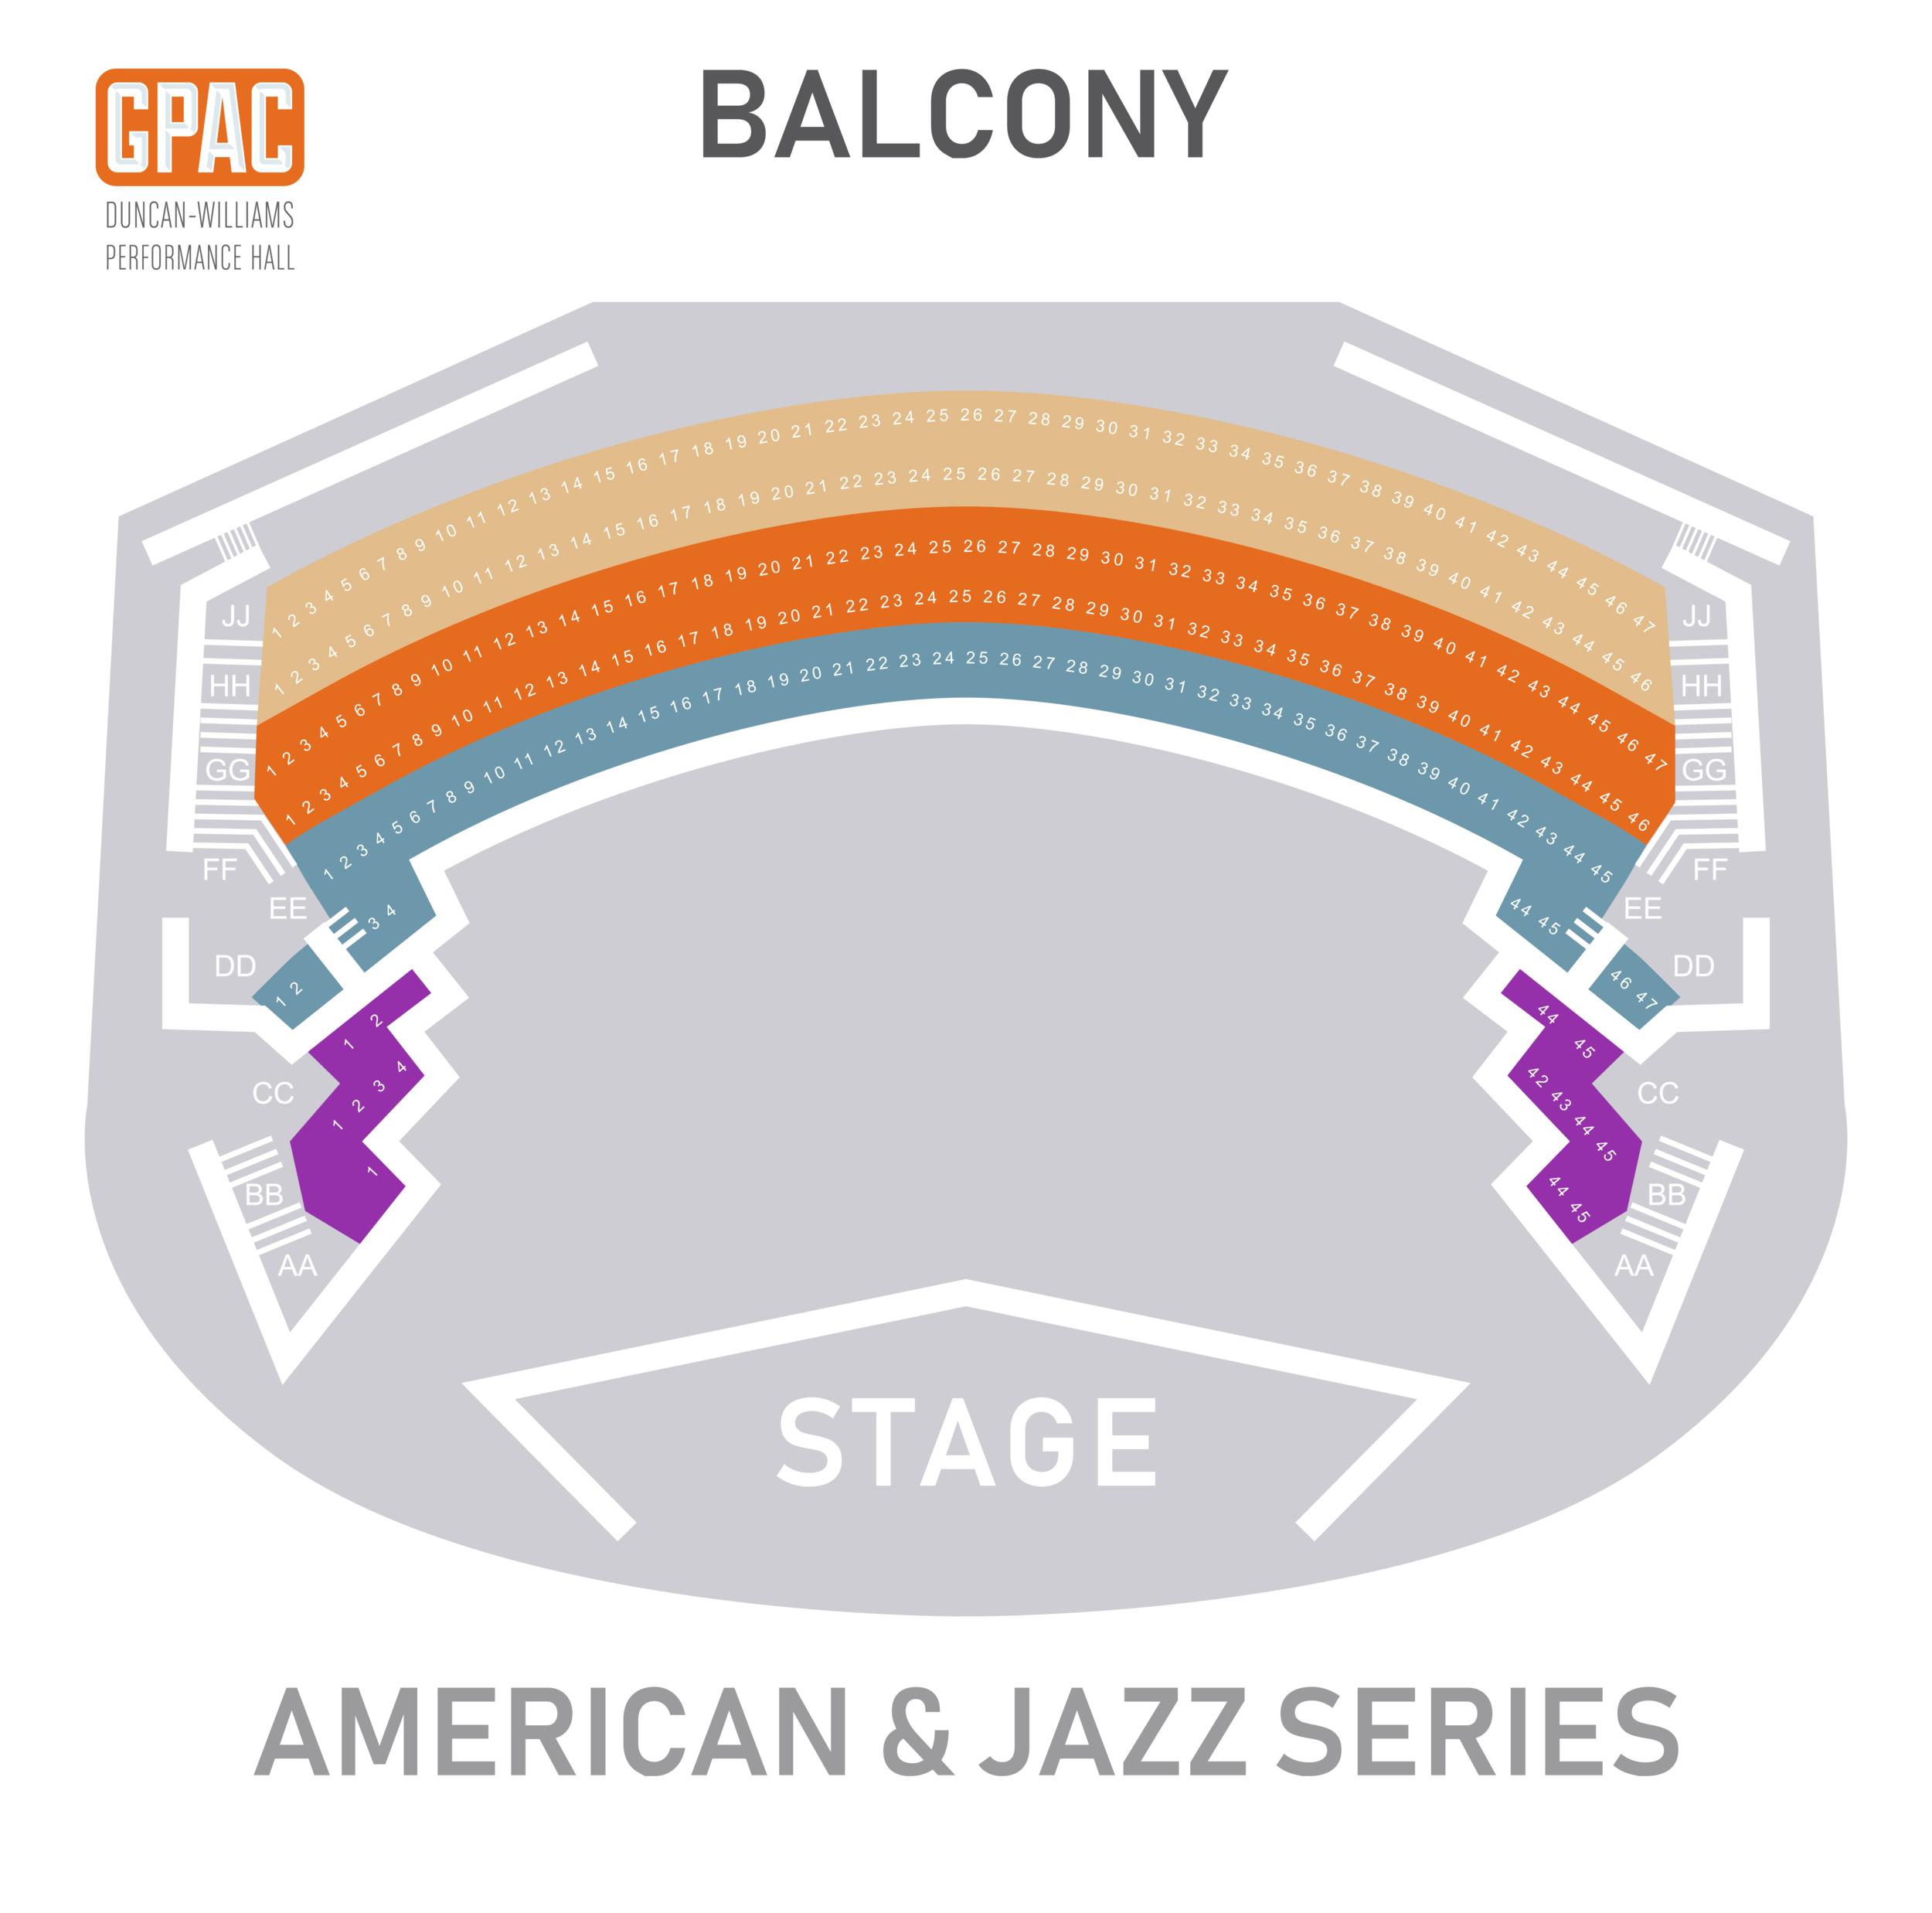 American & Jazz Balcony